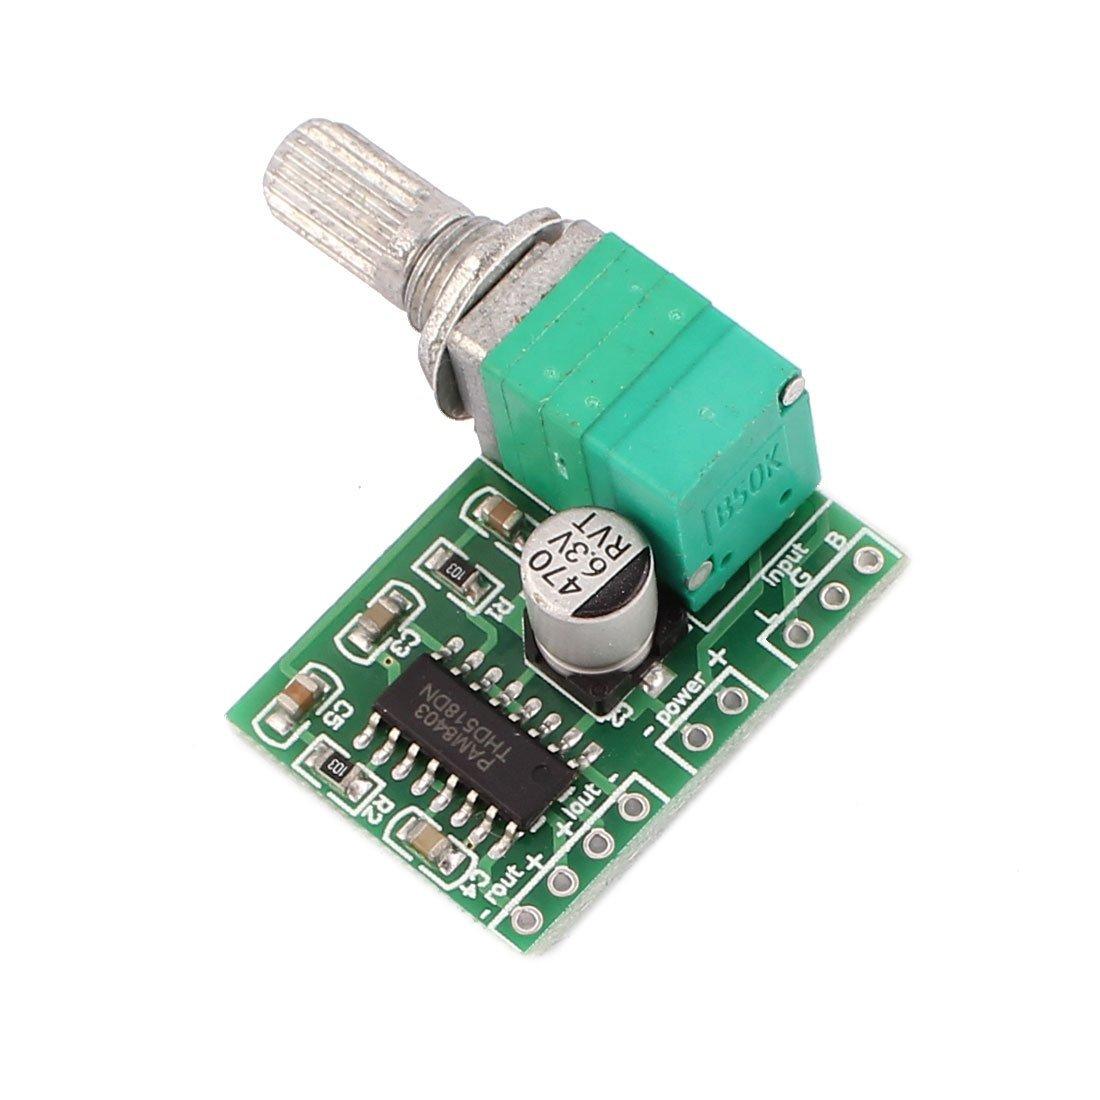 Amazon.com: eDealMax PAM8403 5V Mini Digital Power Amplificador Aplicar Junta Módulo Amplificador: Electronics